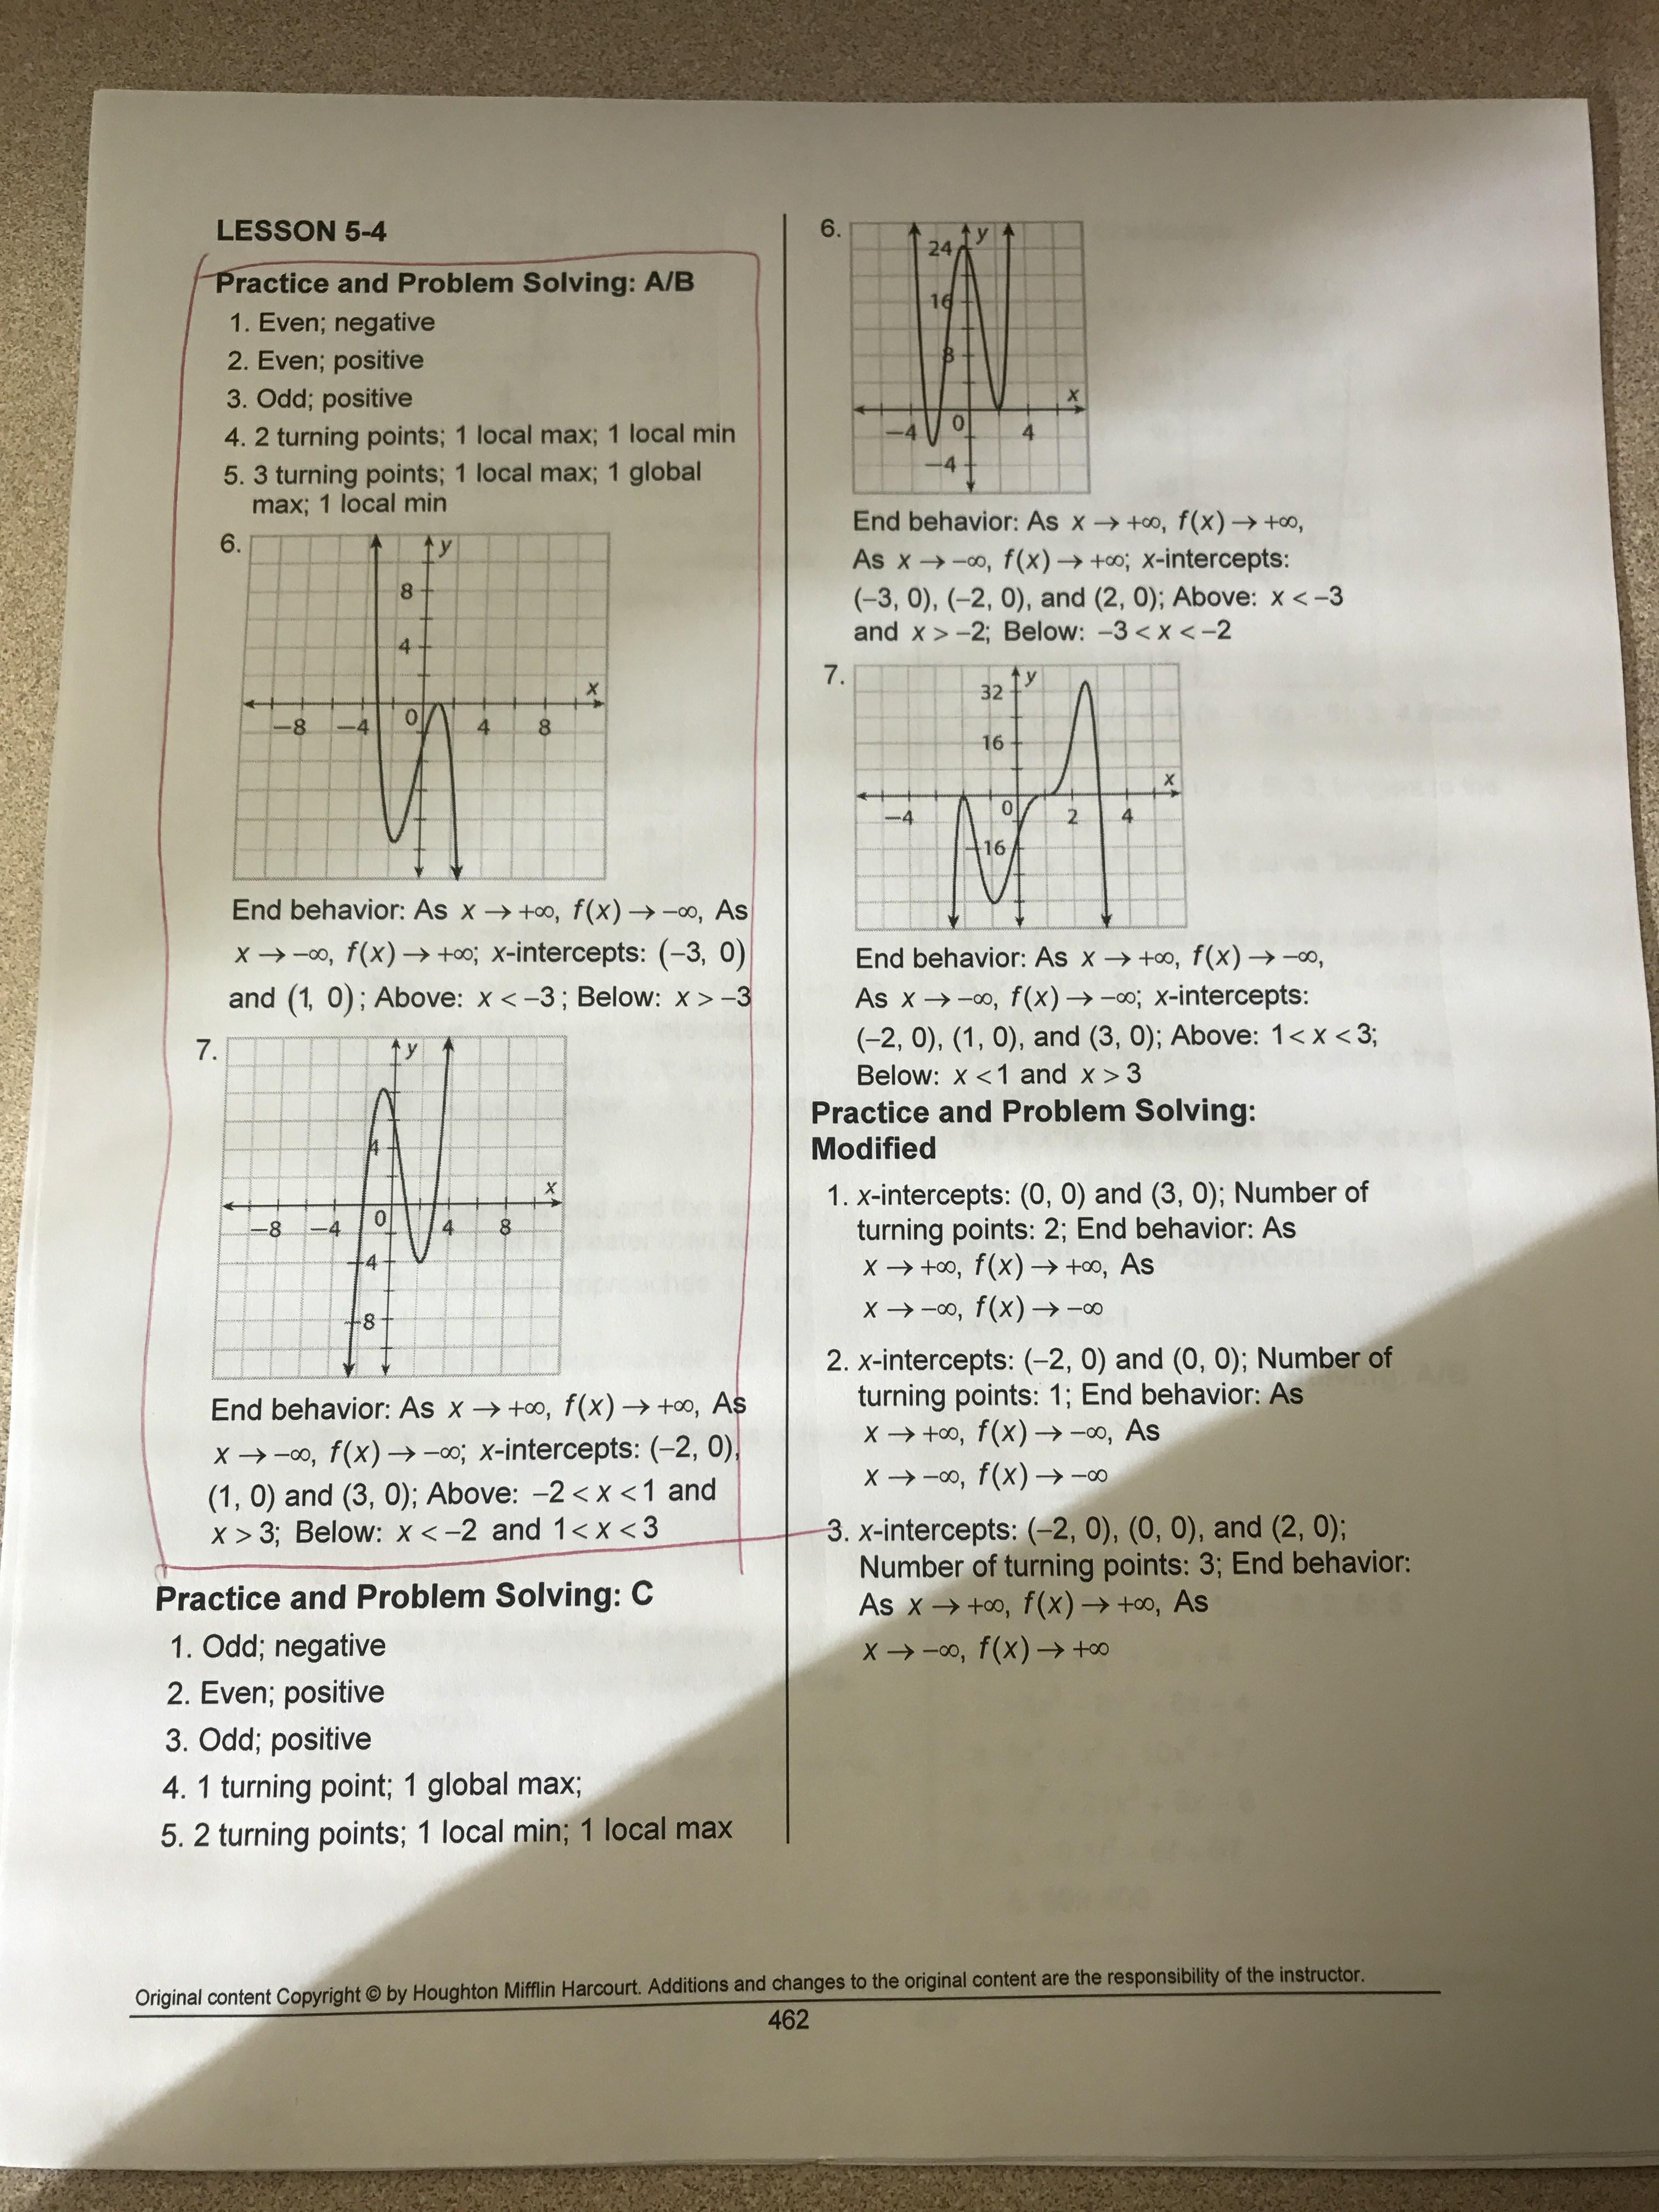 Attractive Harcourt Math Worksheets Crest - Math Worksheets ...